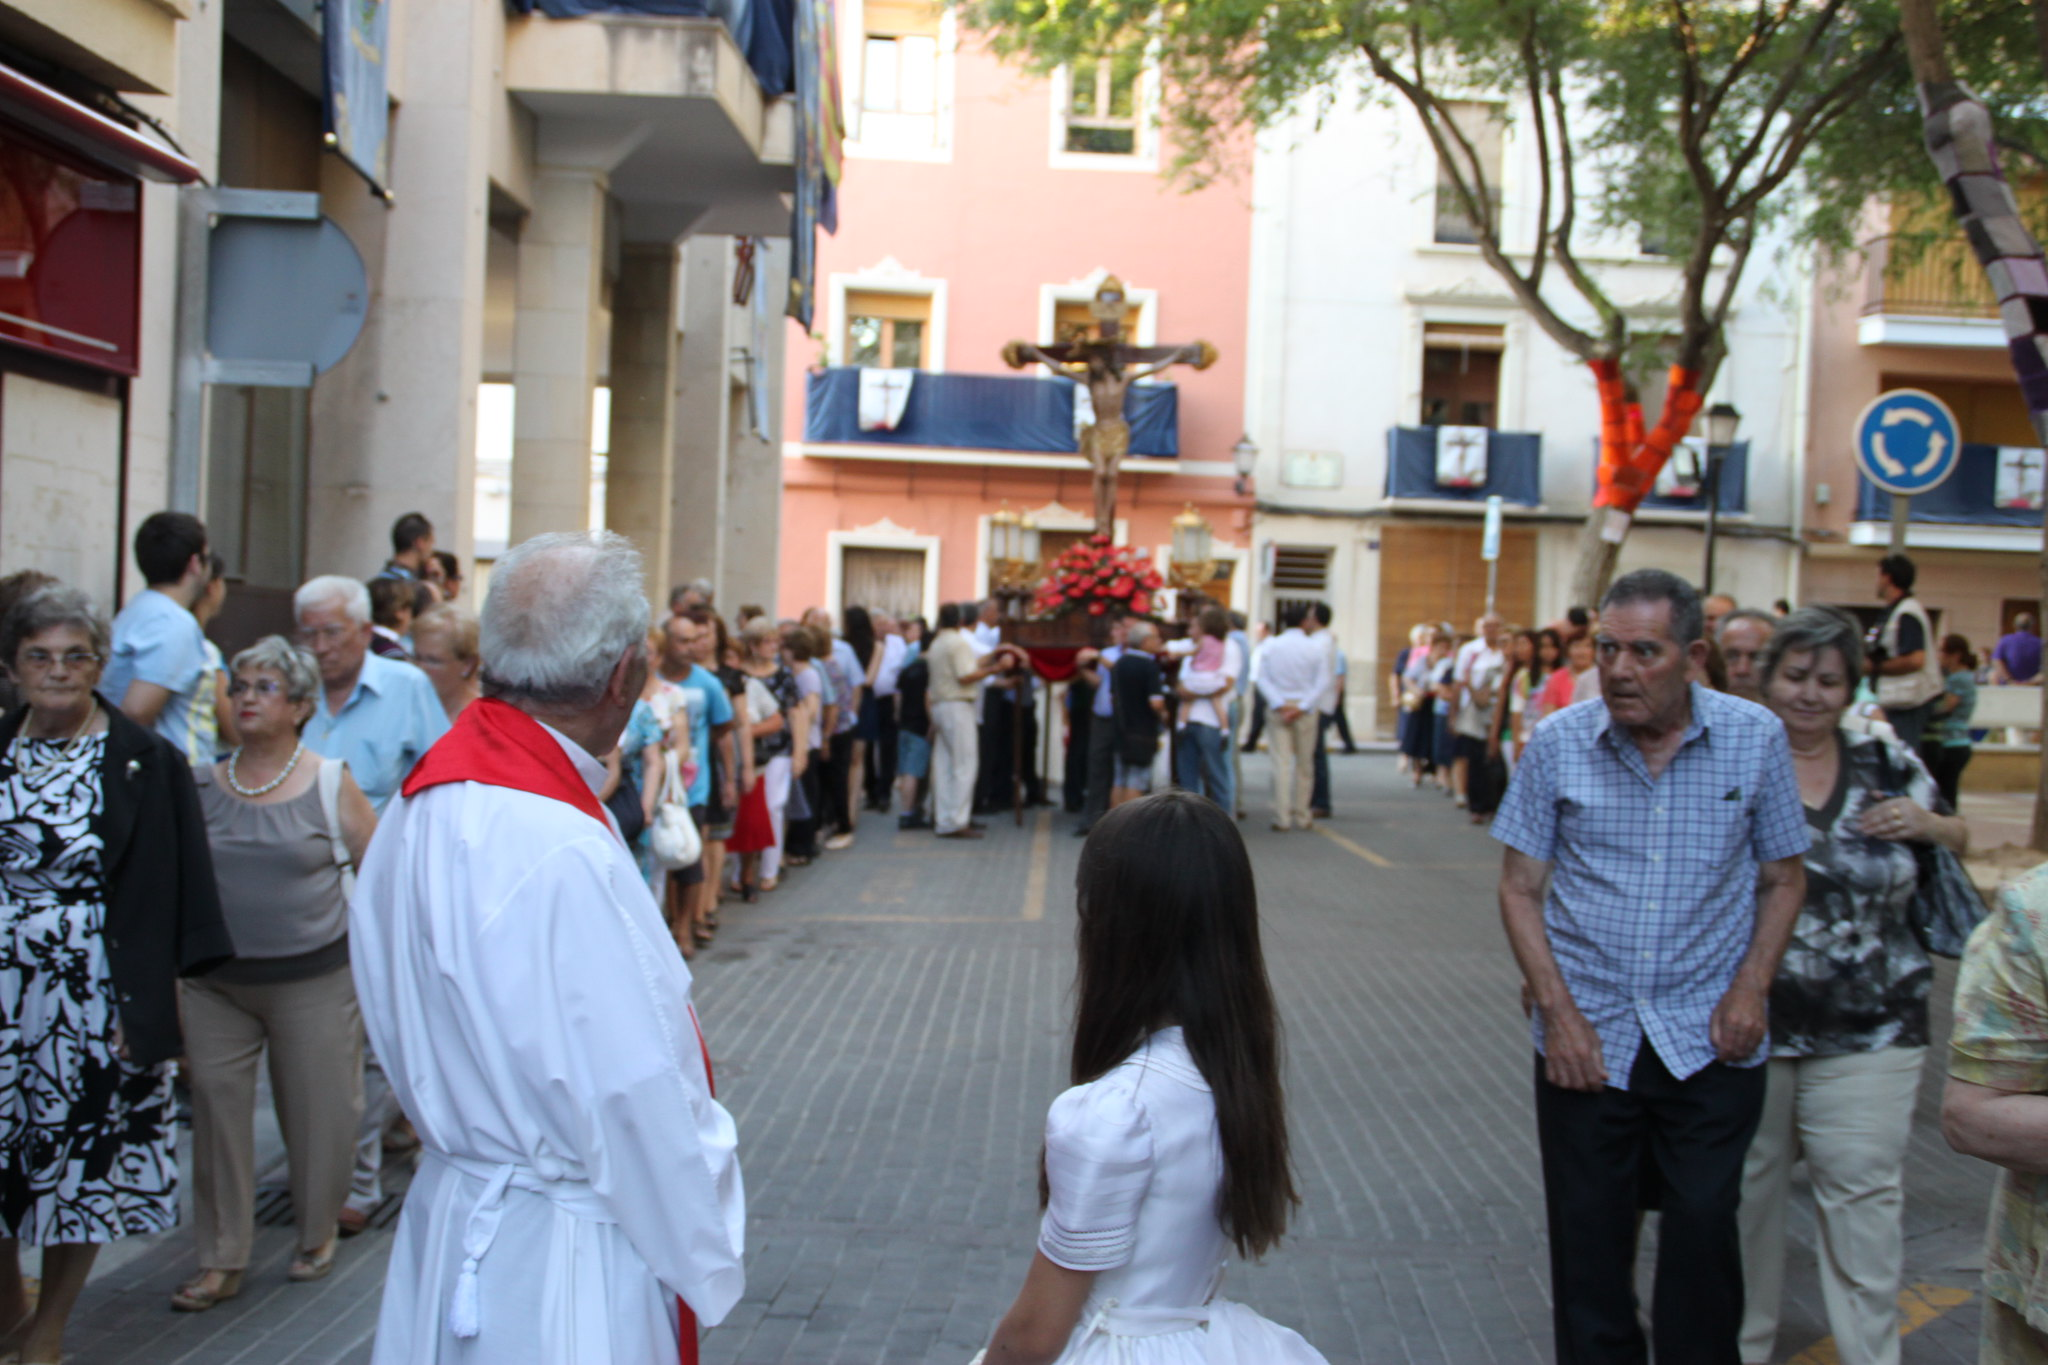 (2013-07-07) -  Procesión subida - Javier Romero Ripoll  (25)